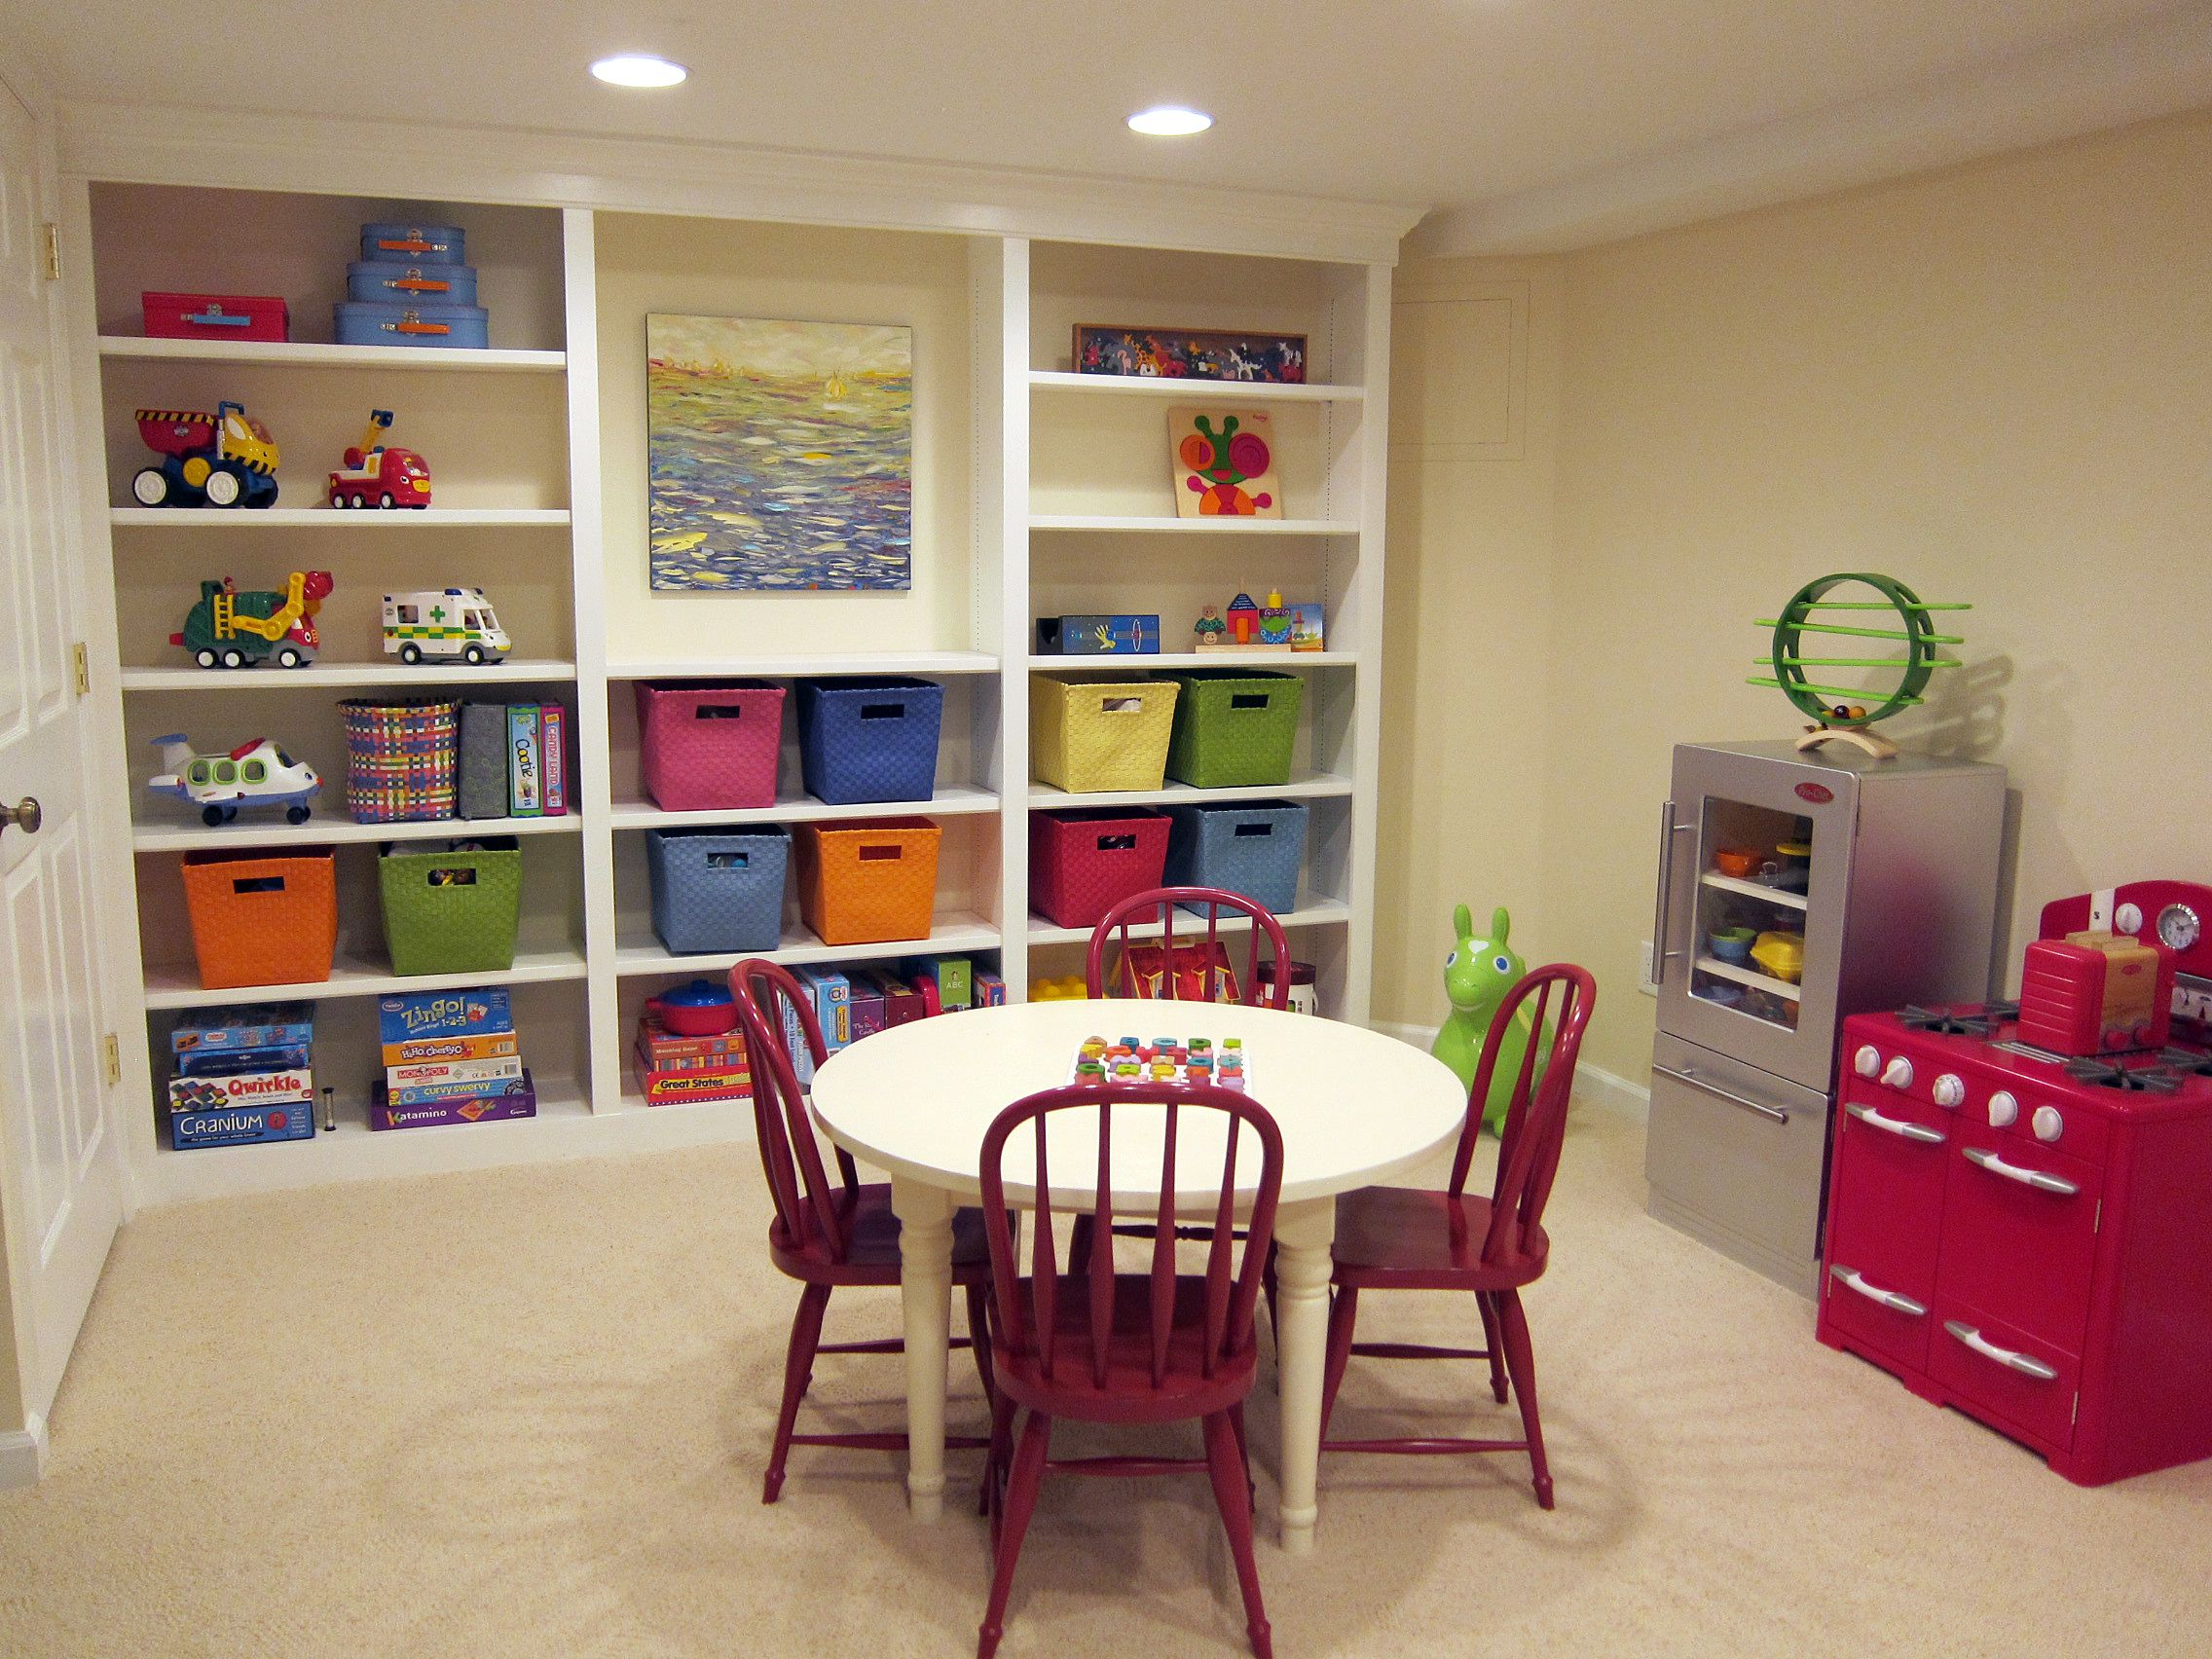 New Bookcase Toy Box White Finish Bedroom Playroom Child: Playroom Area 1 (bookshelf, Play